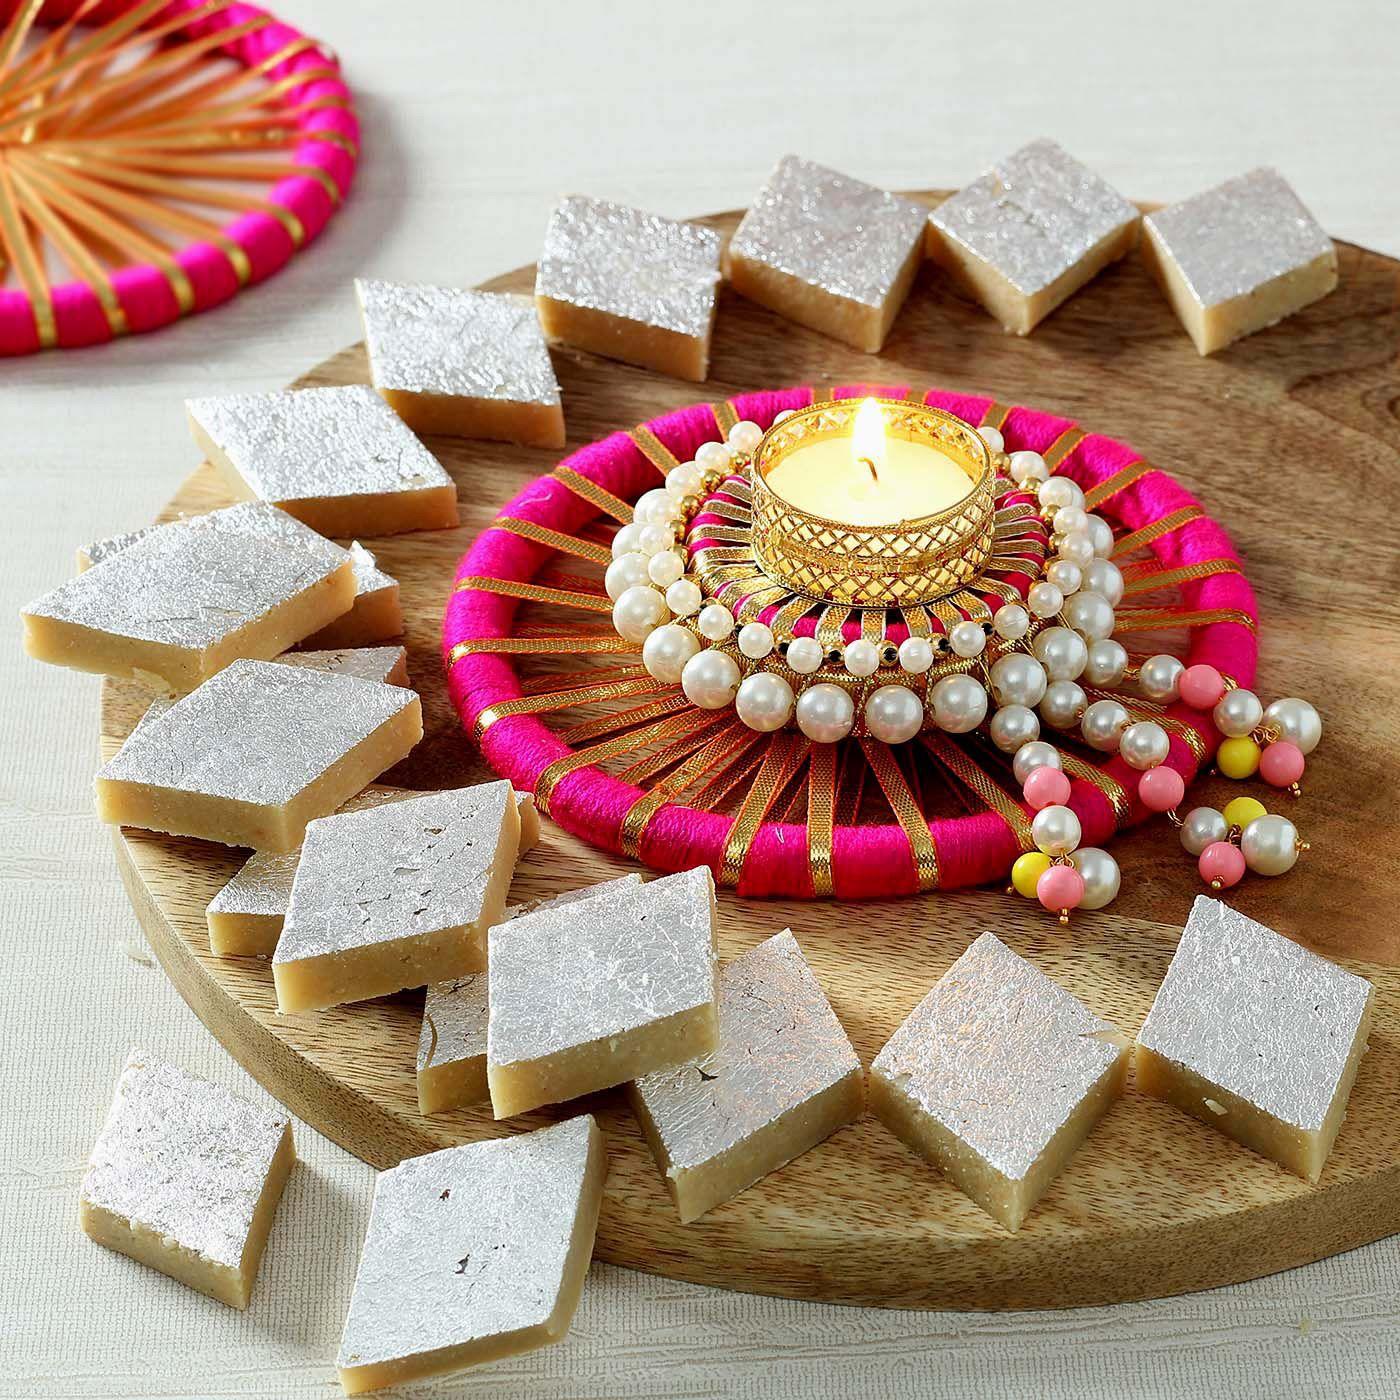 Decorative Candle Diya with Kaju Katli Diwali gifts